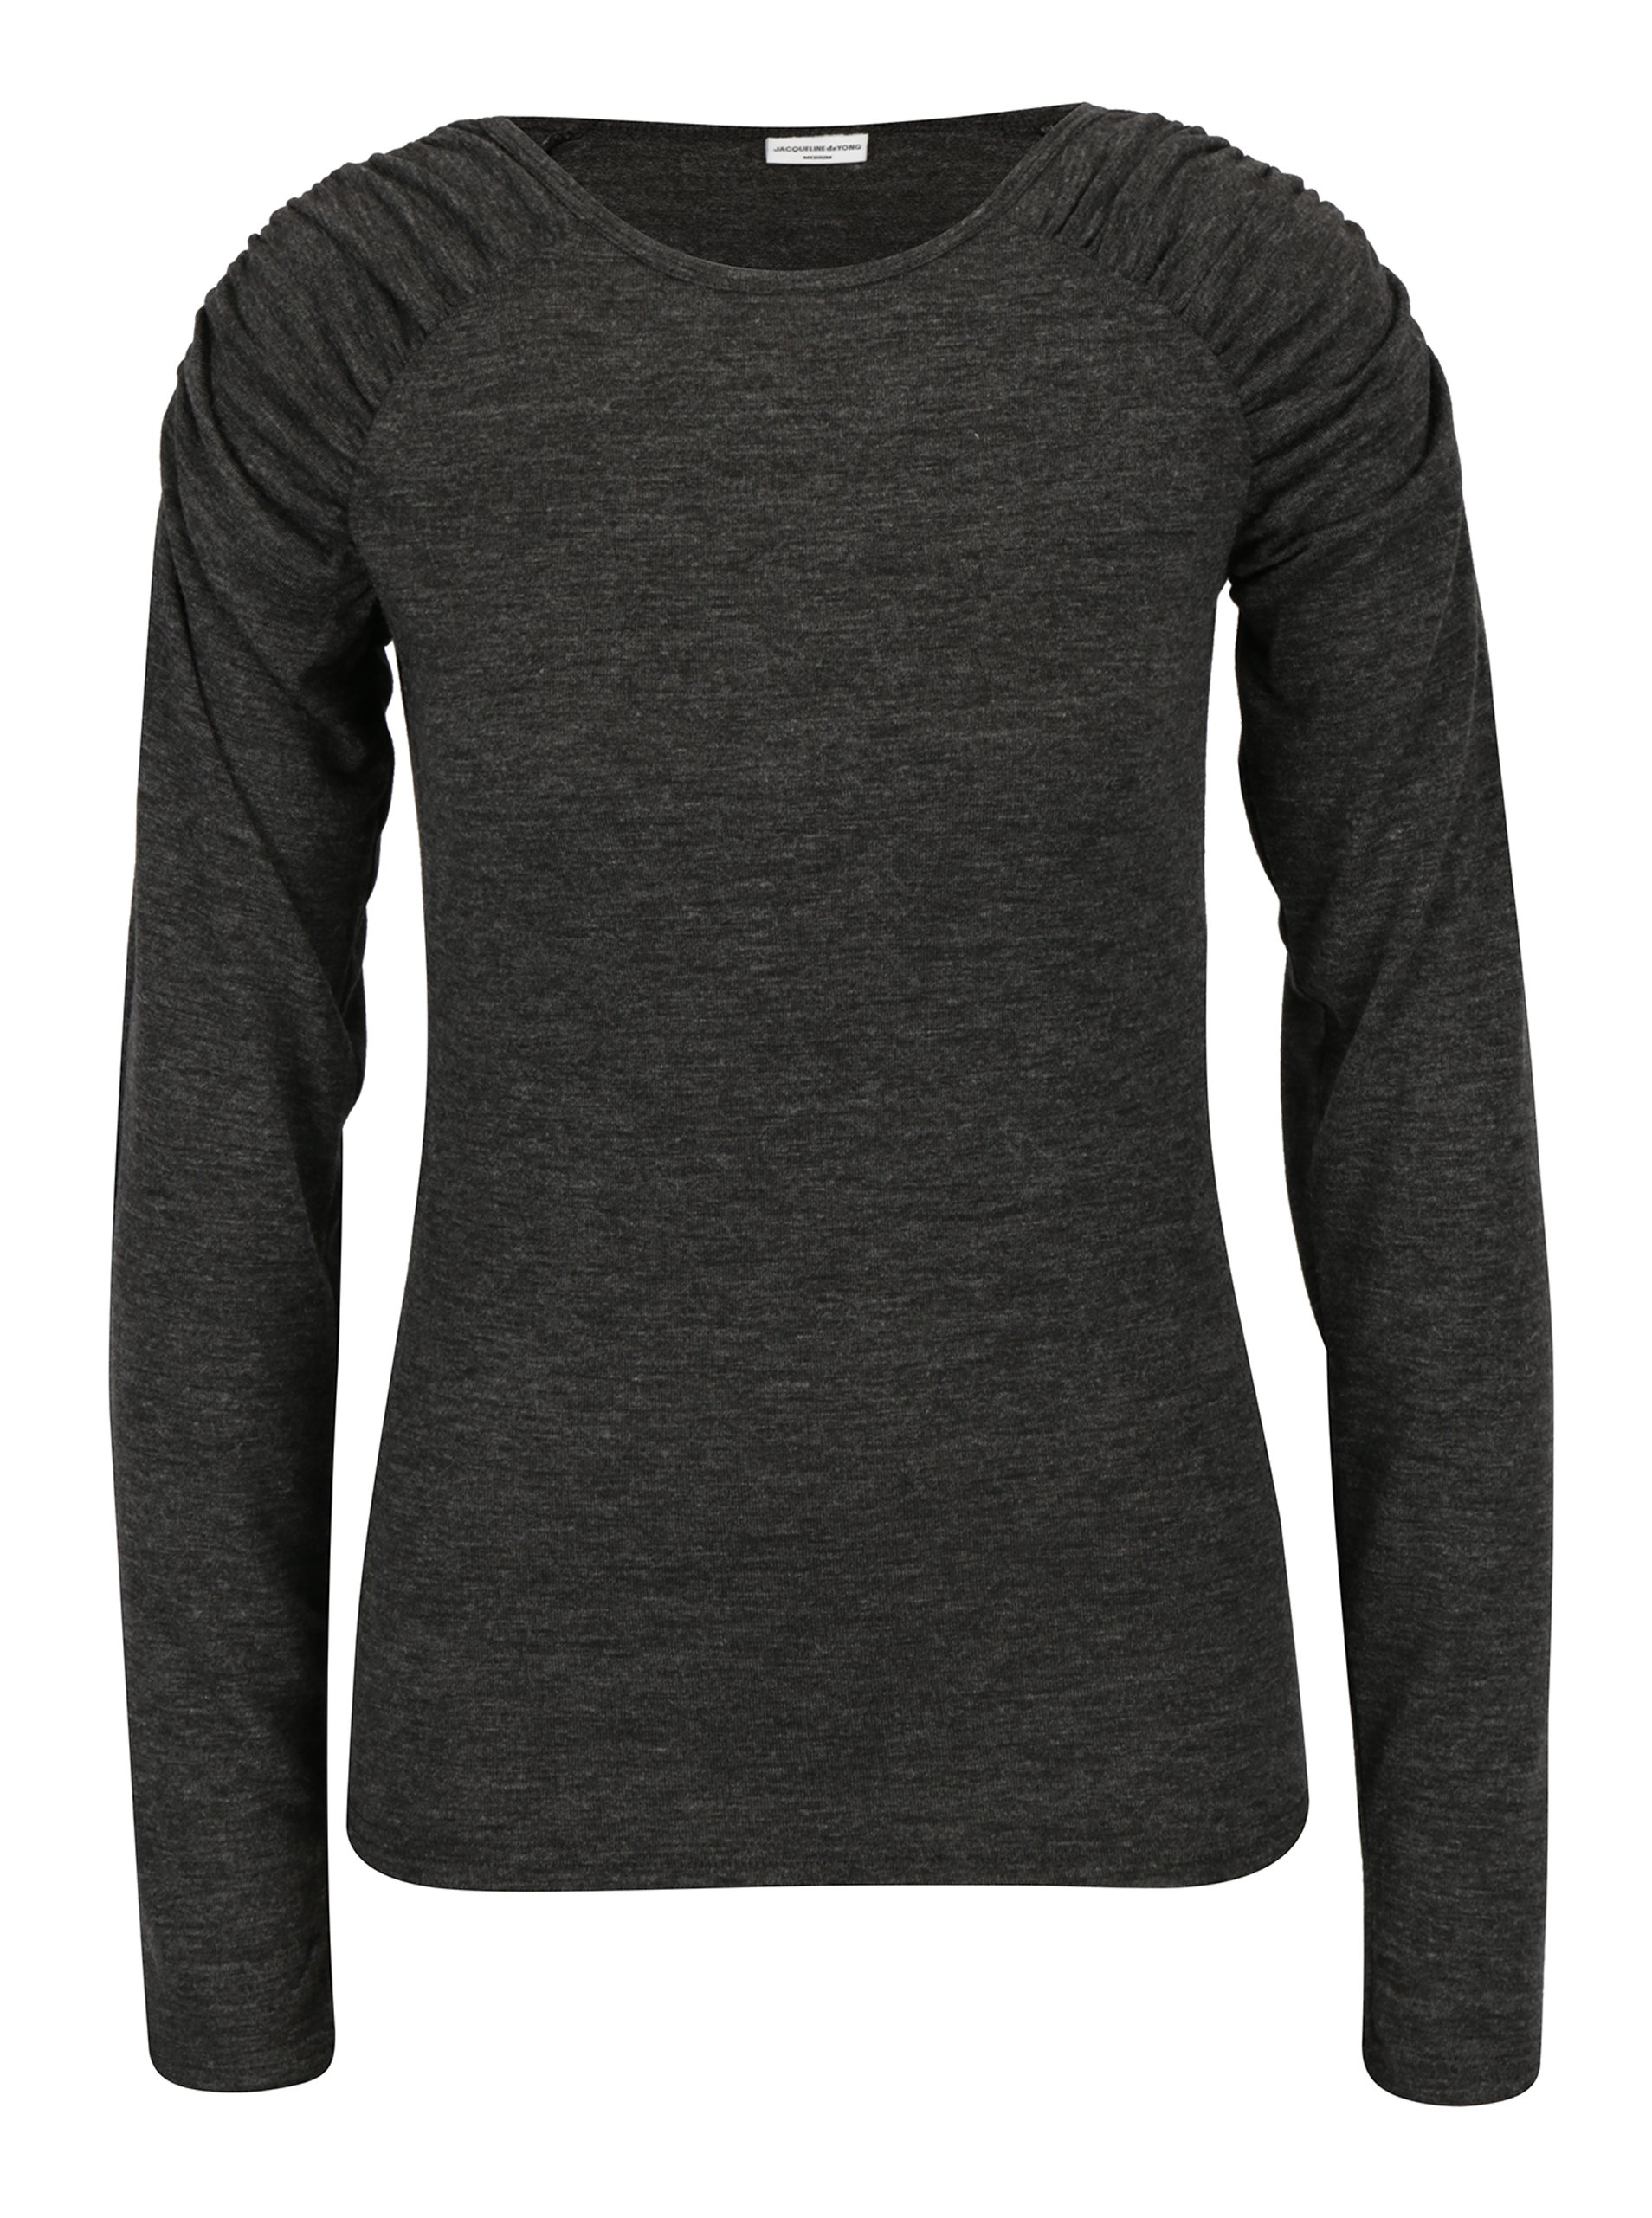 Tmavě šedé žíhané tričko s řasením na ramenou Jacqueline de Yong Adora